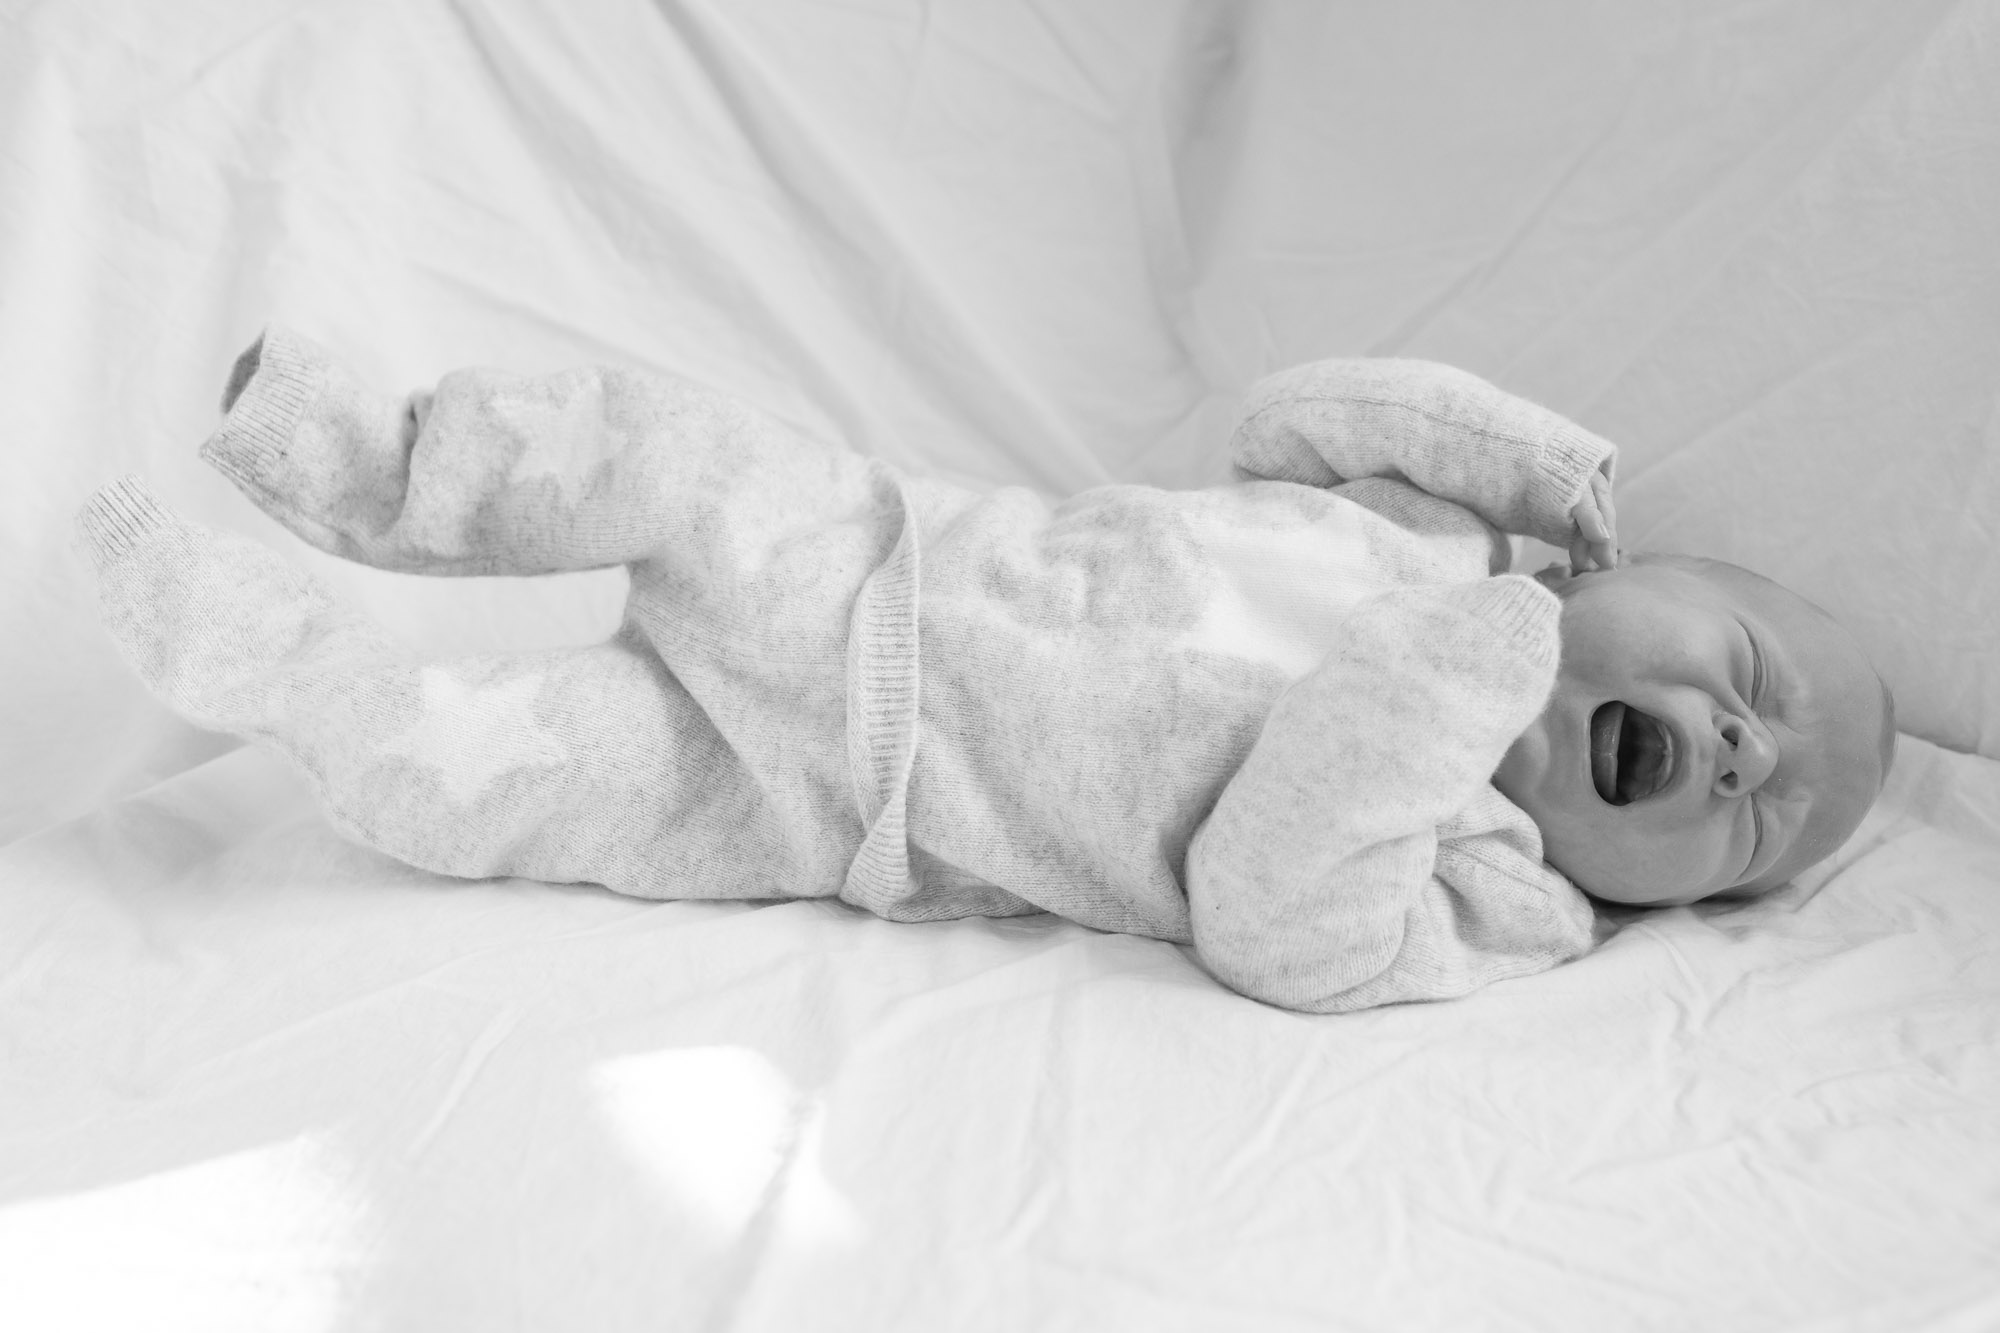 newborn-baby-family-portrait-photographer-084.jpg